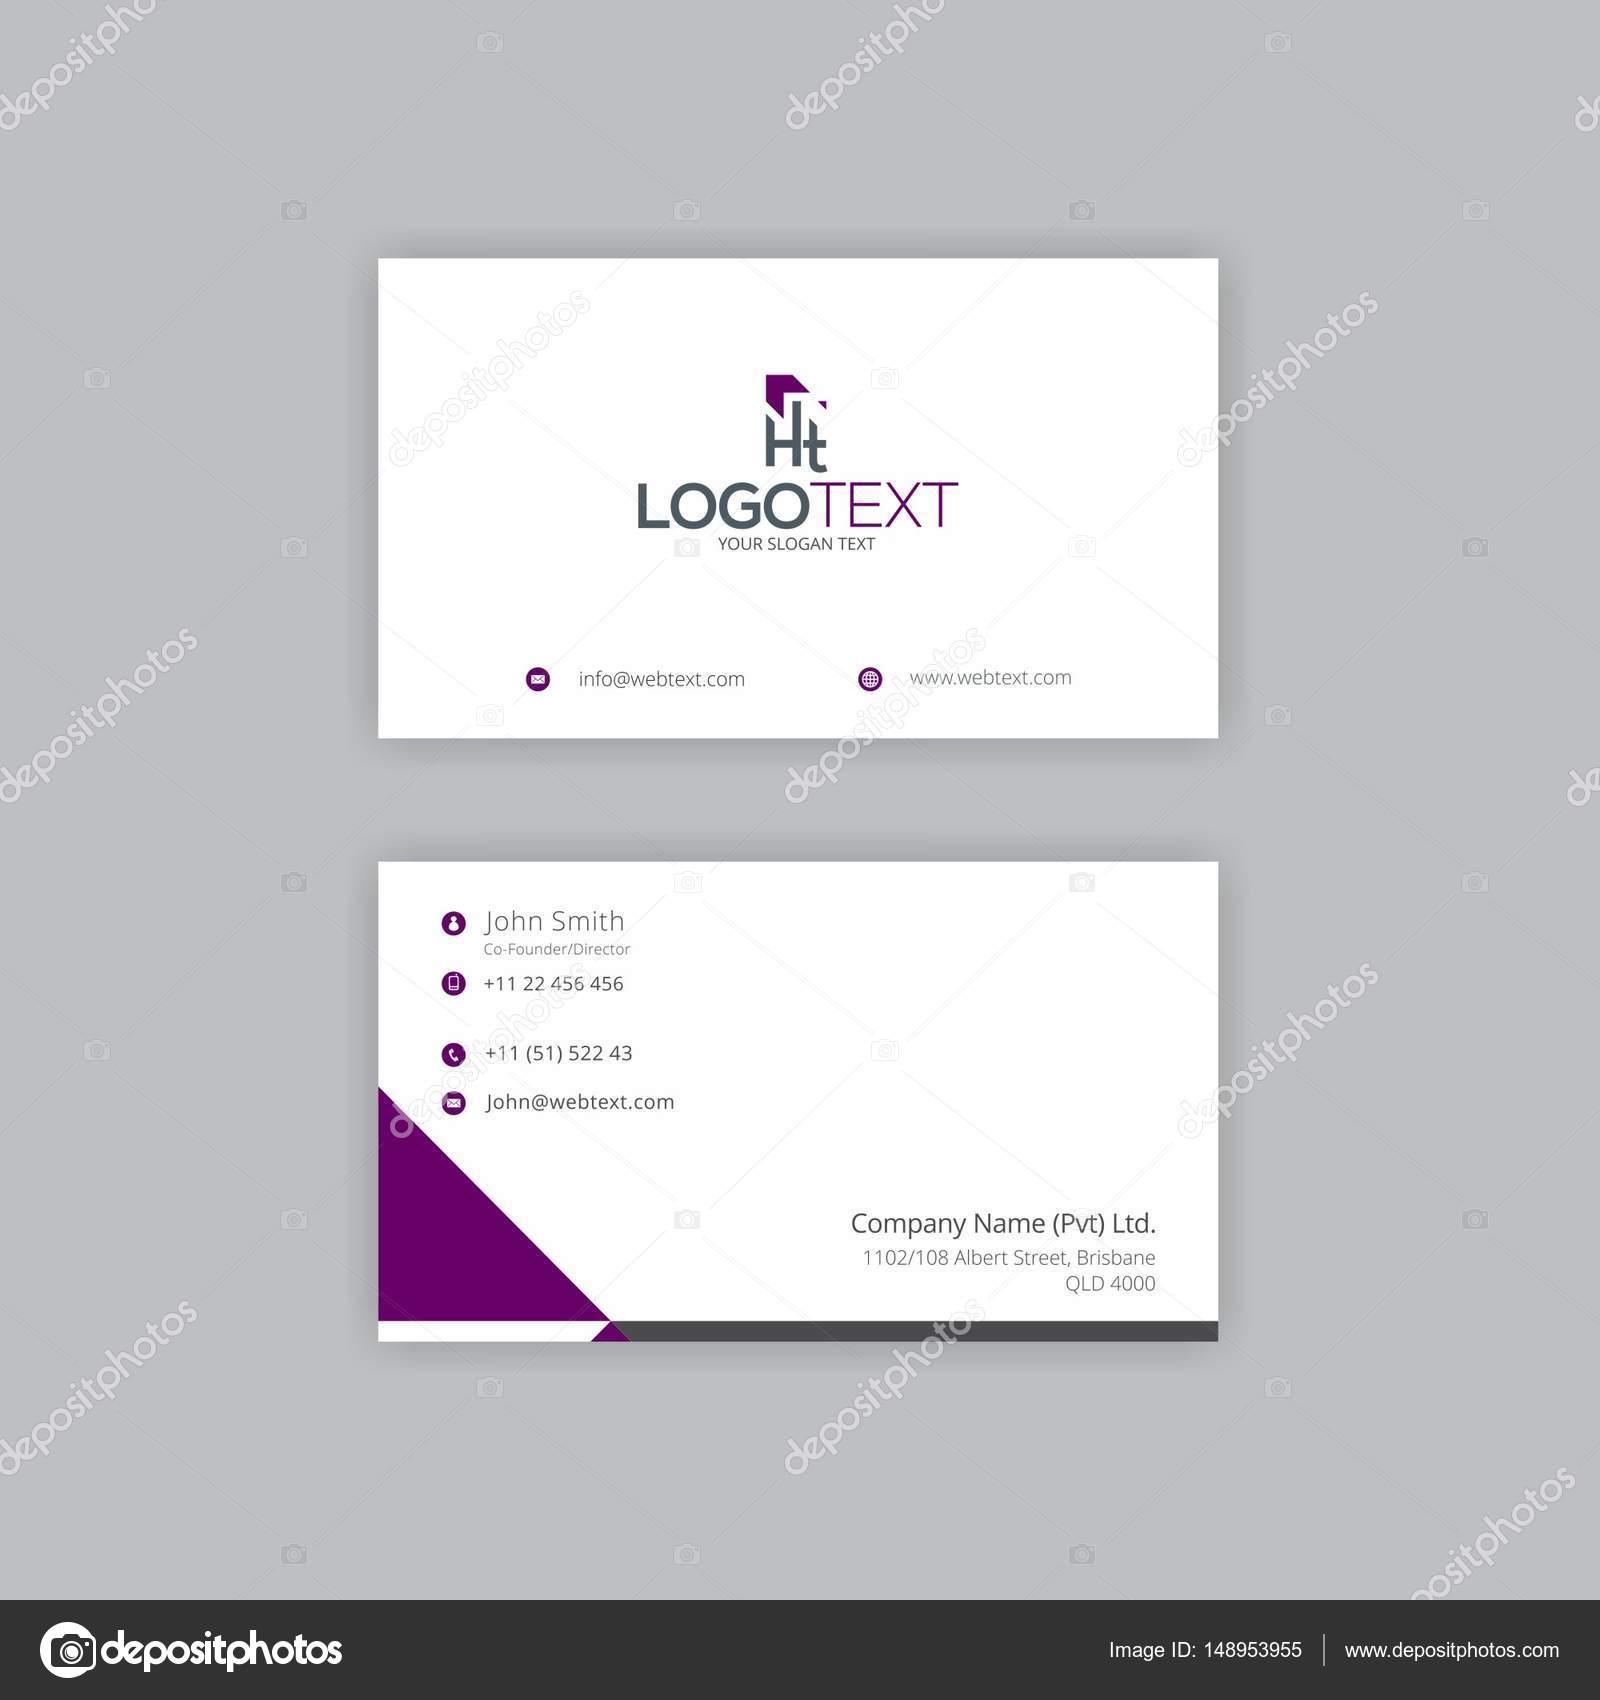 Digital IT company Business Card Design — Stock Vector ...